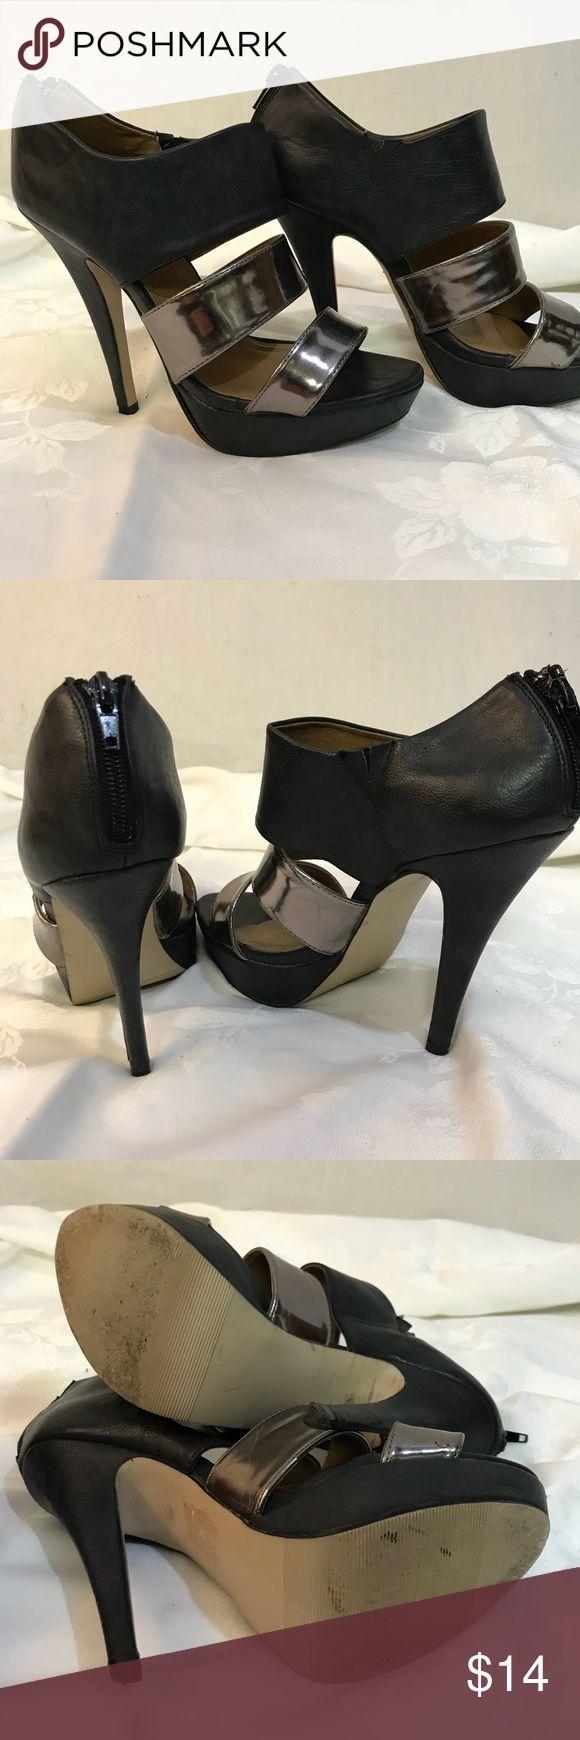 Madden Girl Juniperr Heels Madden Girl Juniperr Platform Heels. Women's size 8z Great Condition- see pics. Zip up heel, black and silver straps. Madden Girl Shoes Heels